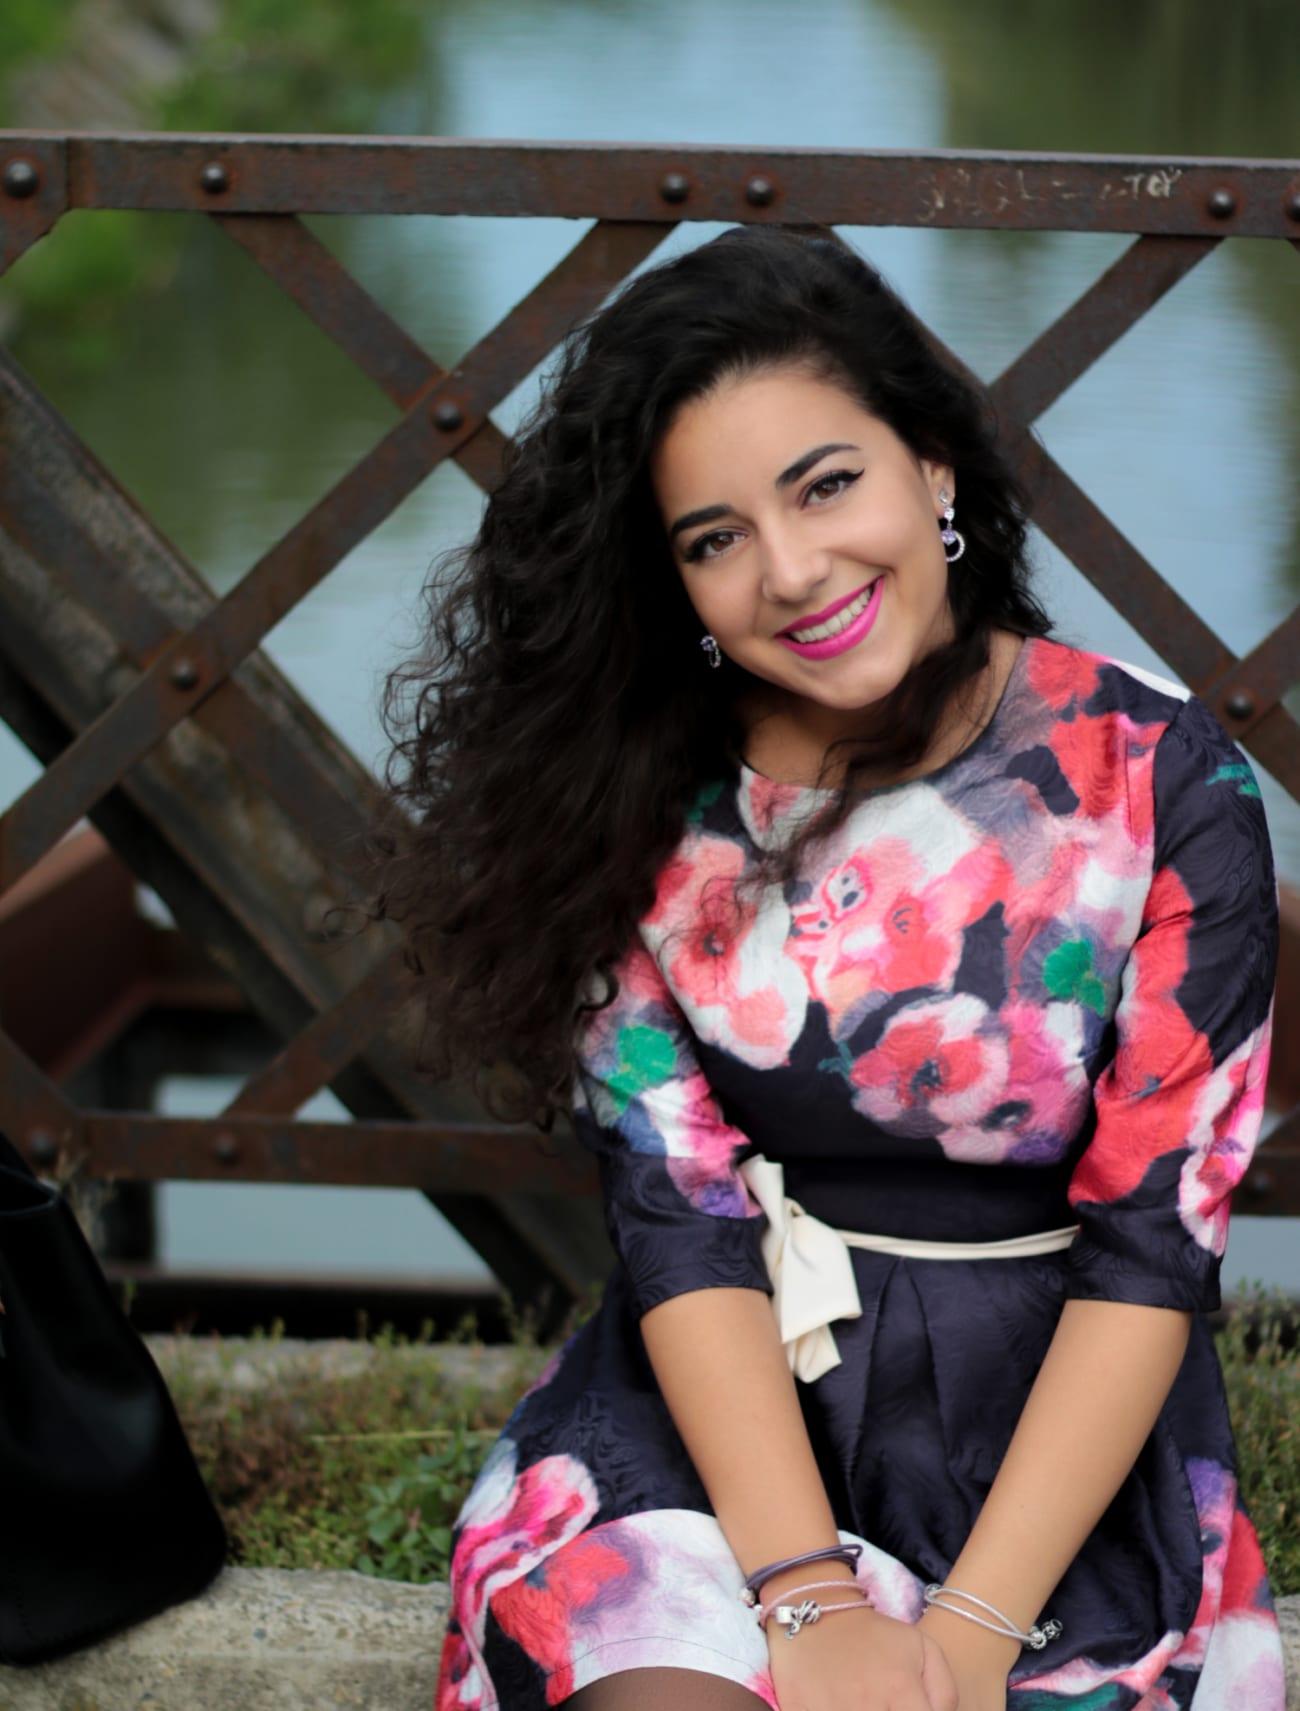 top-fashion-pareri-roxi-rose-timisoara-fashion-blogger-rochia-cu-flori-floral-dress-review-favorite-fashion-item-and-why-clothing-piece smile